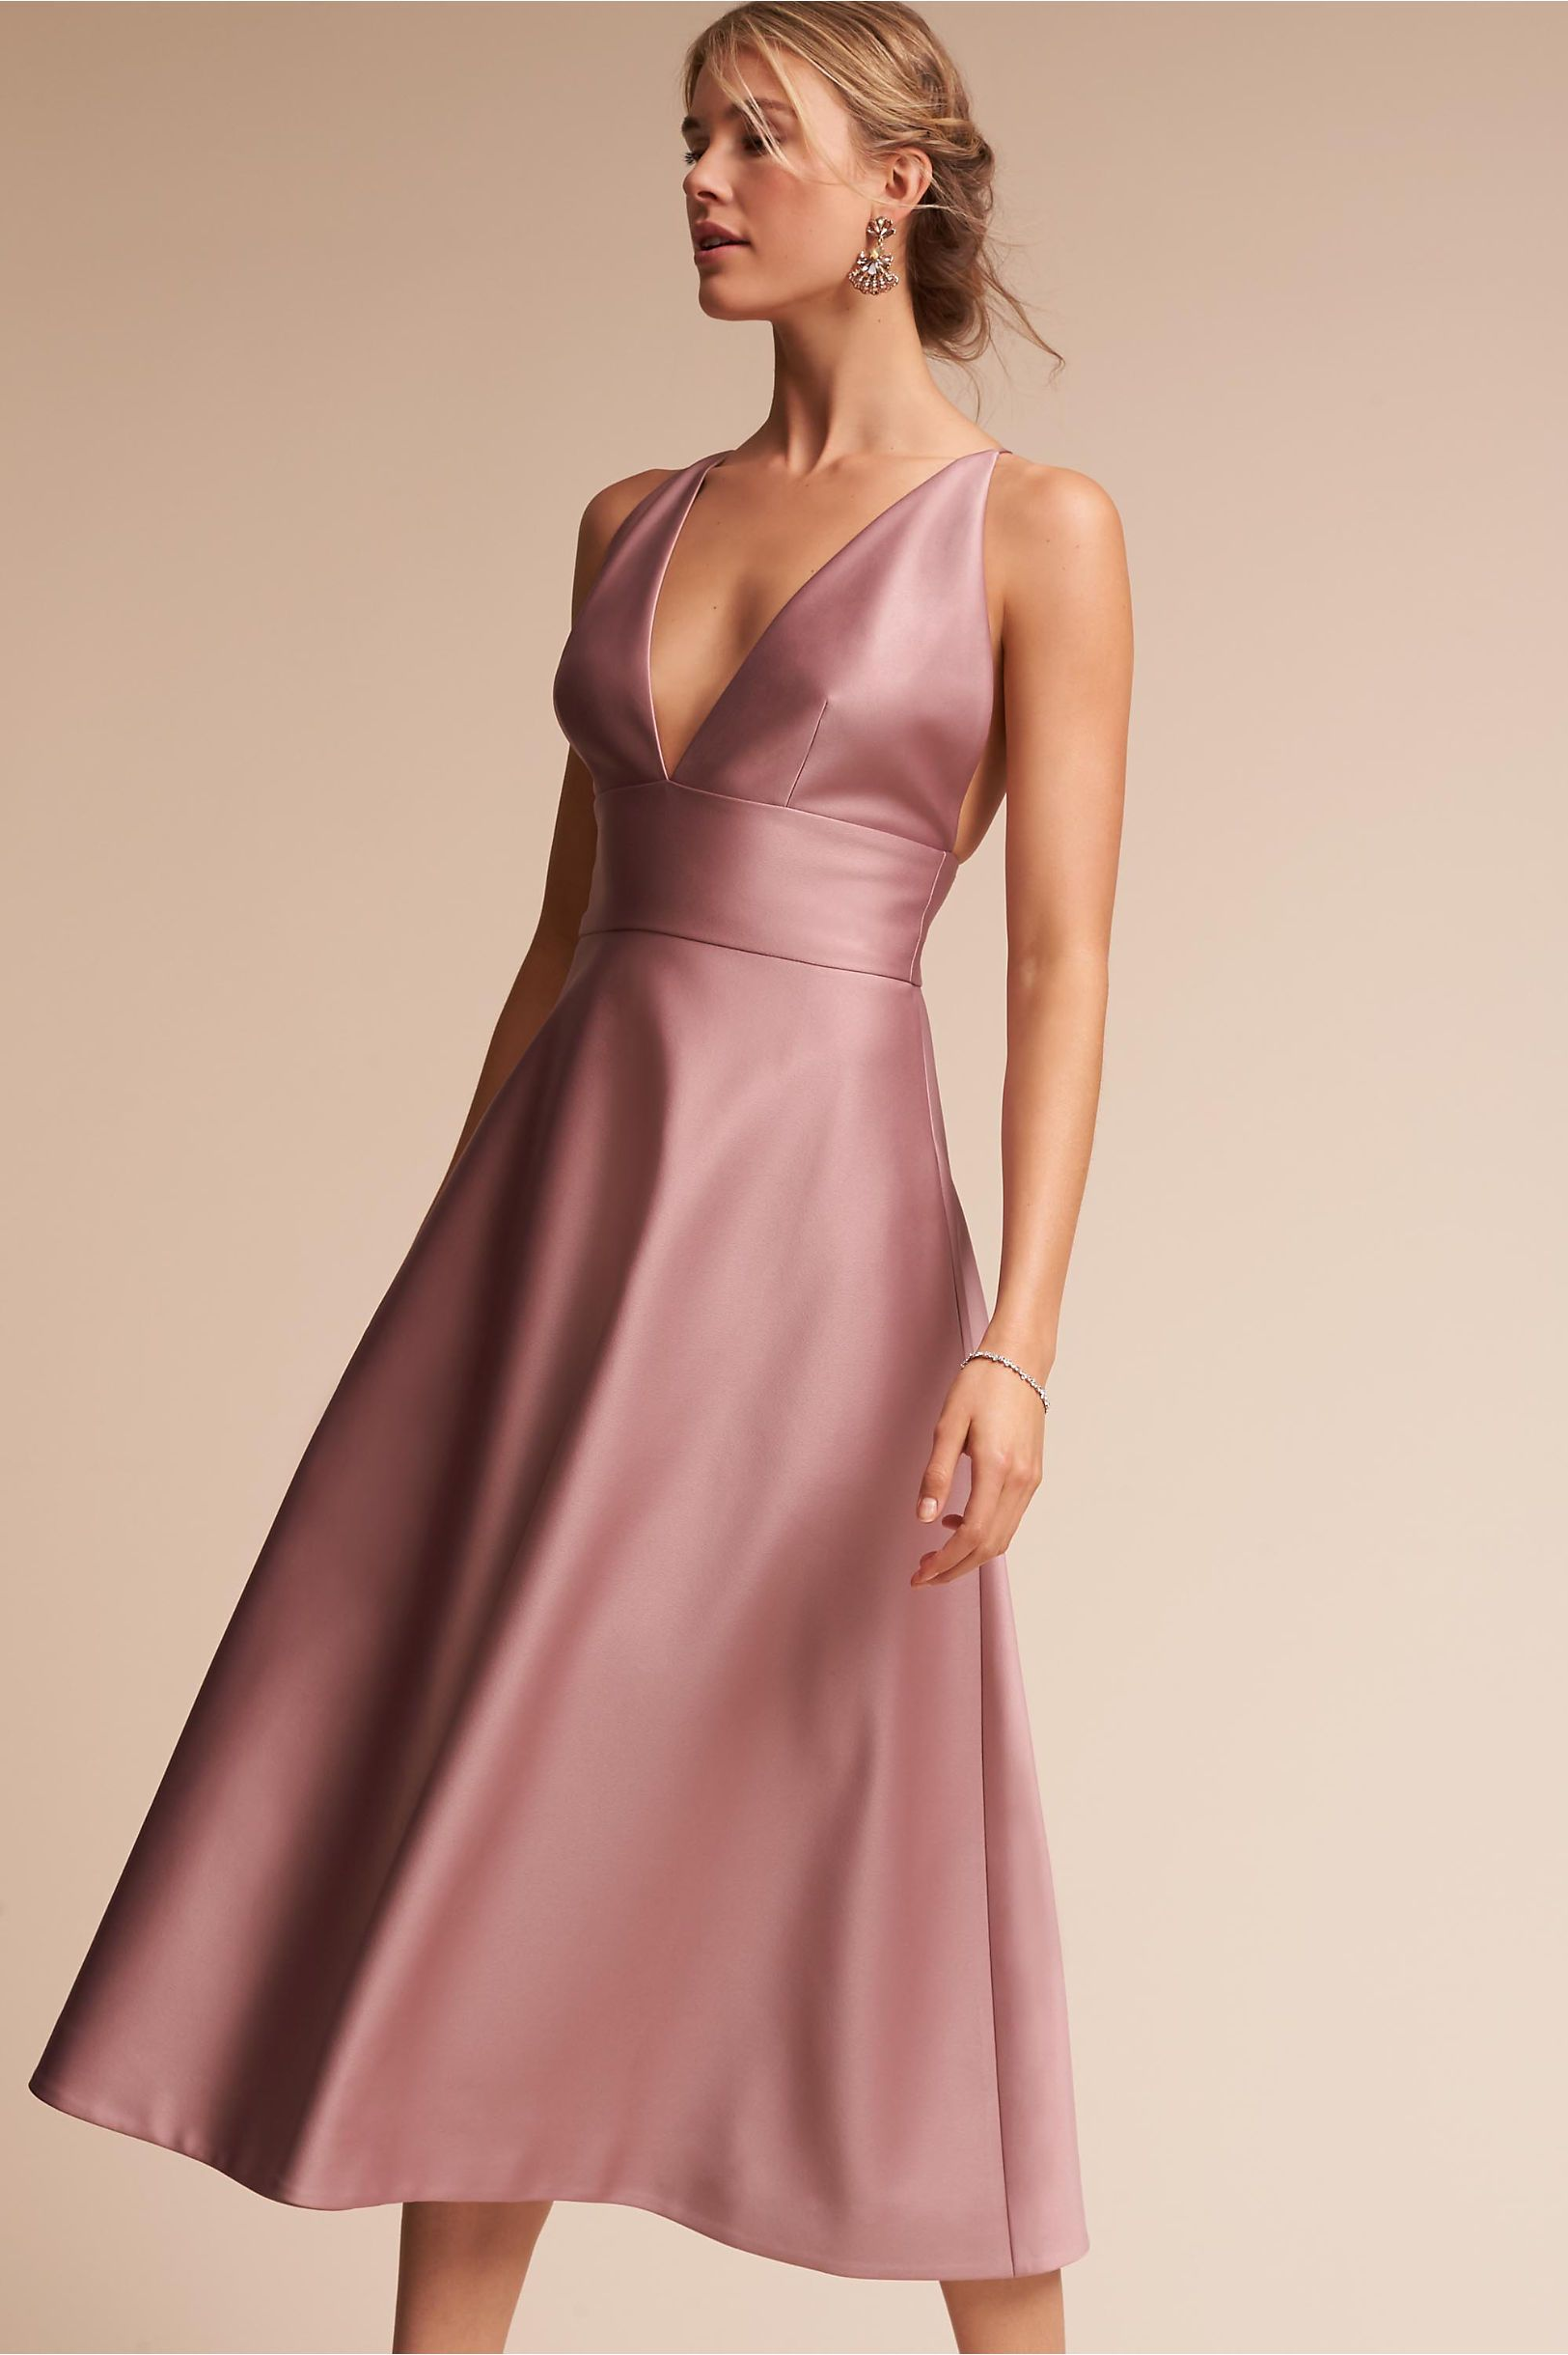 BHLDN\'s Hitherto Shelby Dress in Rose Quartz | Eterno femenino ...